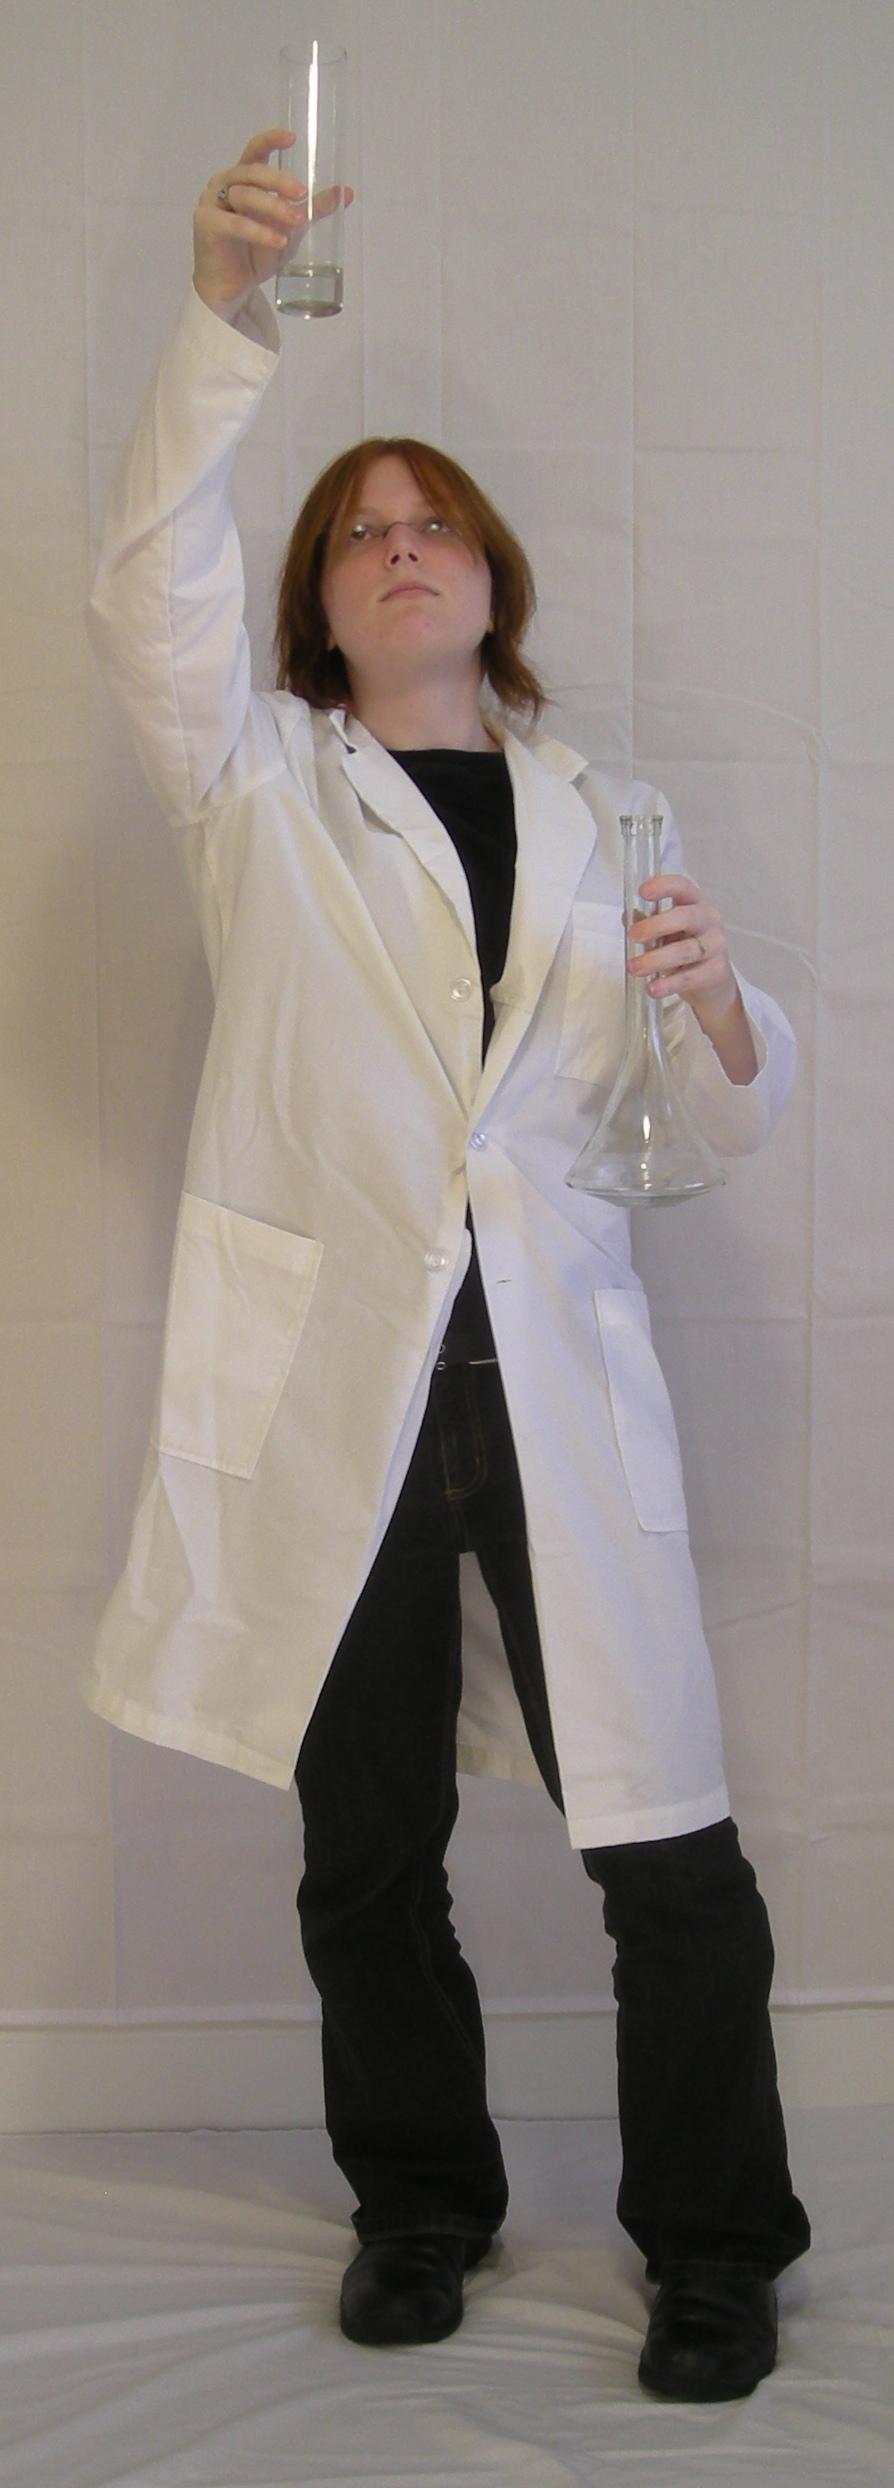 Mad Scientist Mari 13 by TwilightAmazonStock